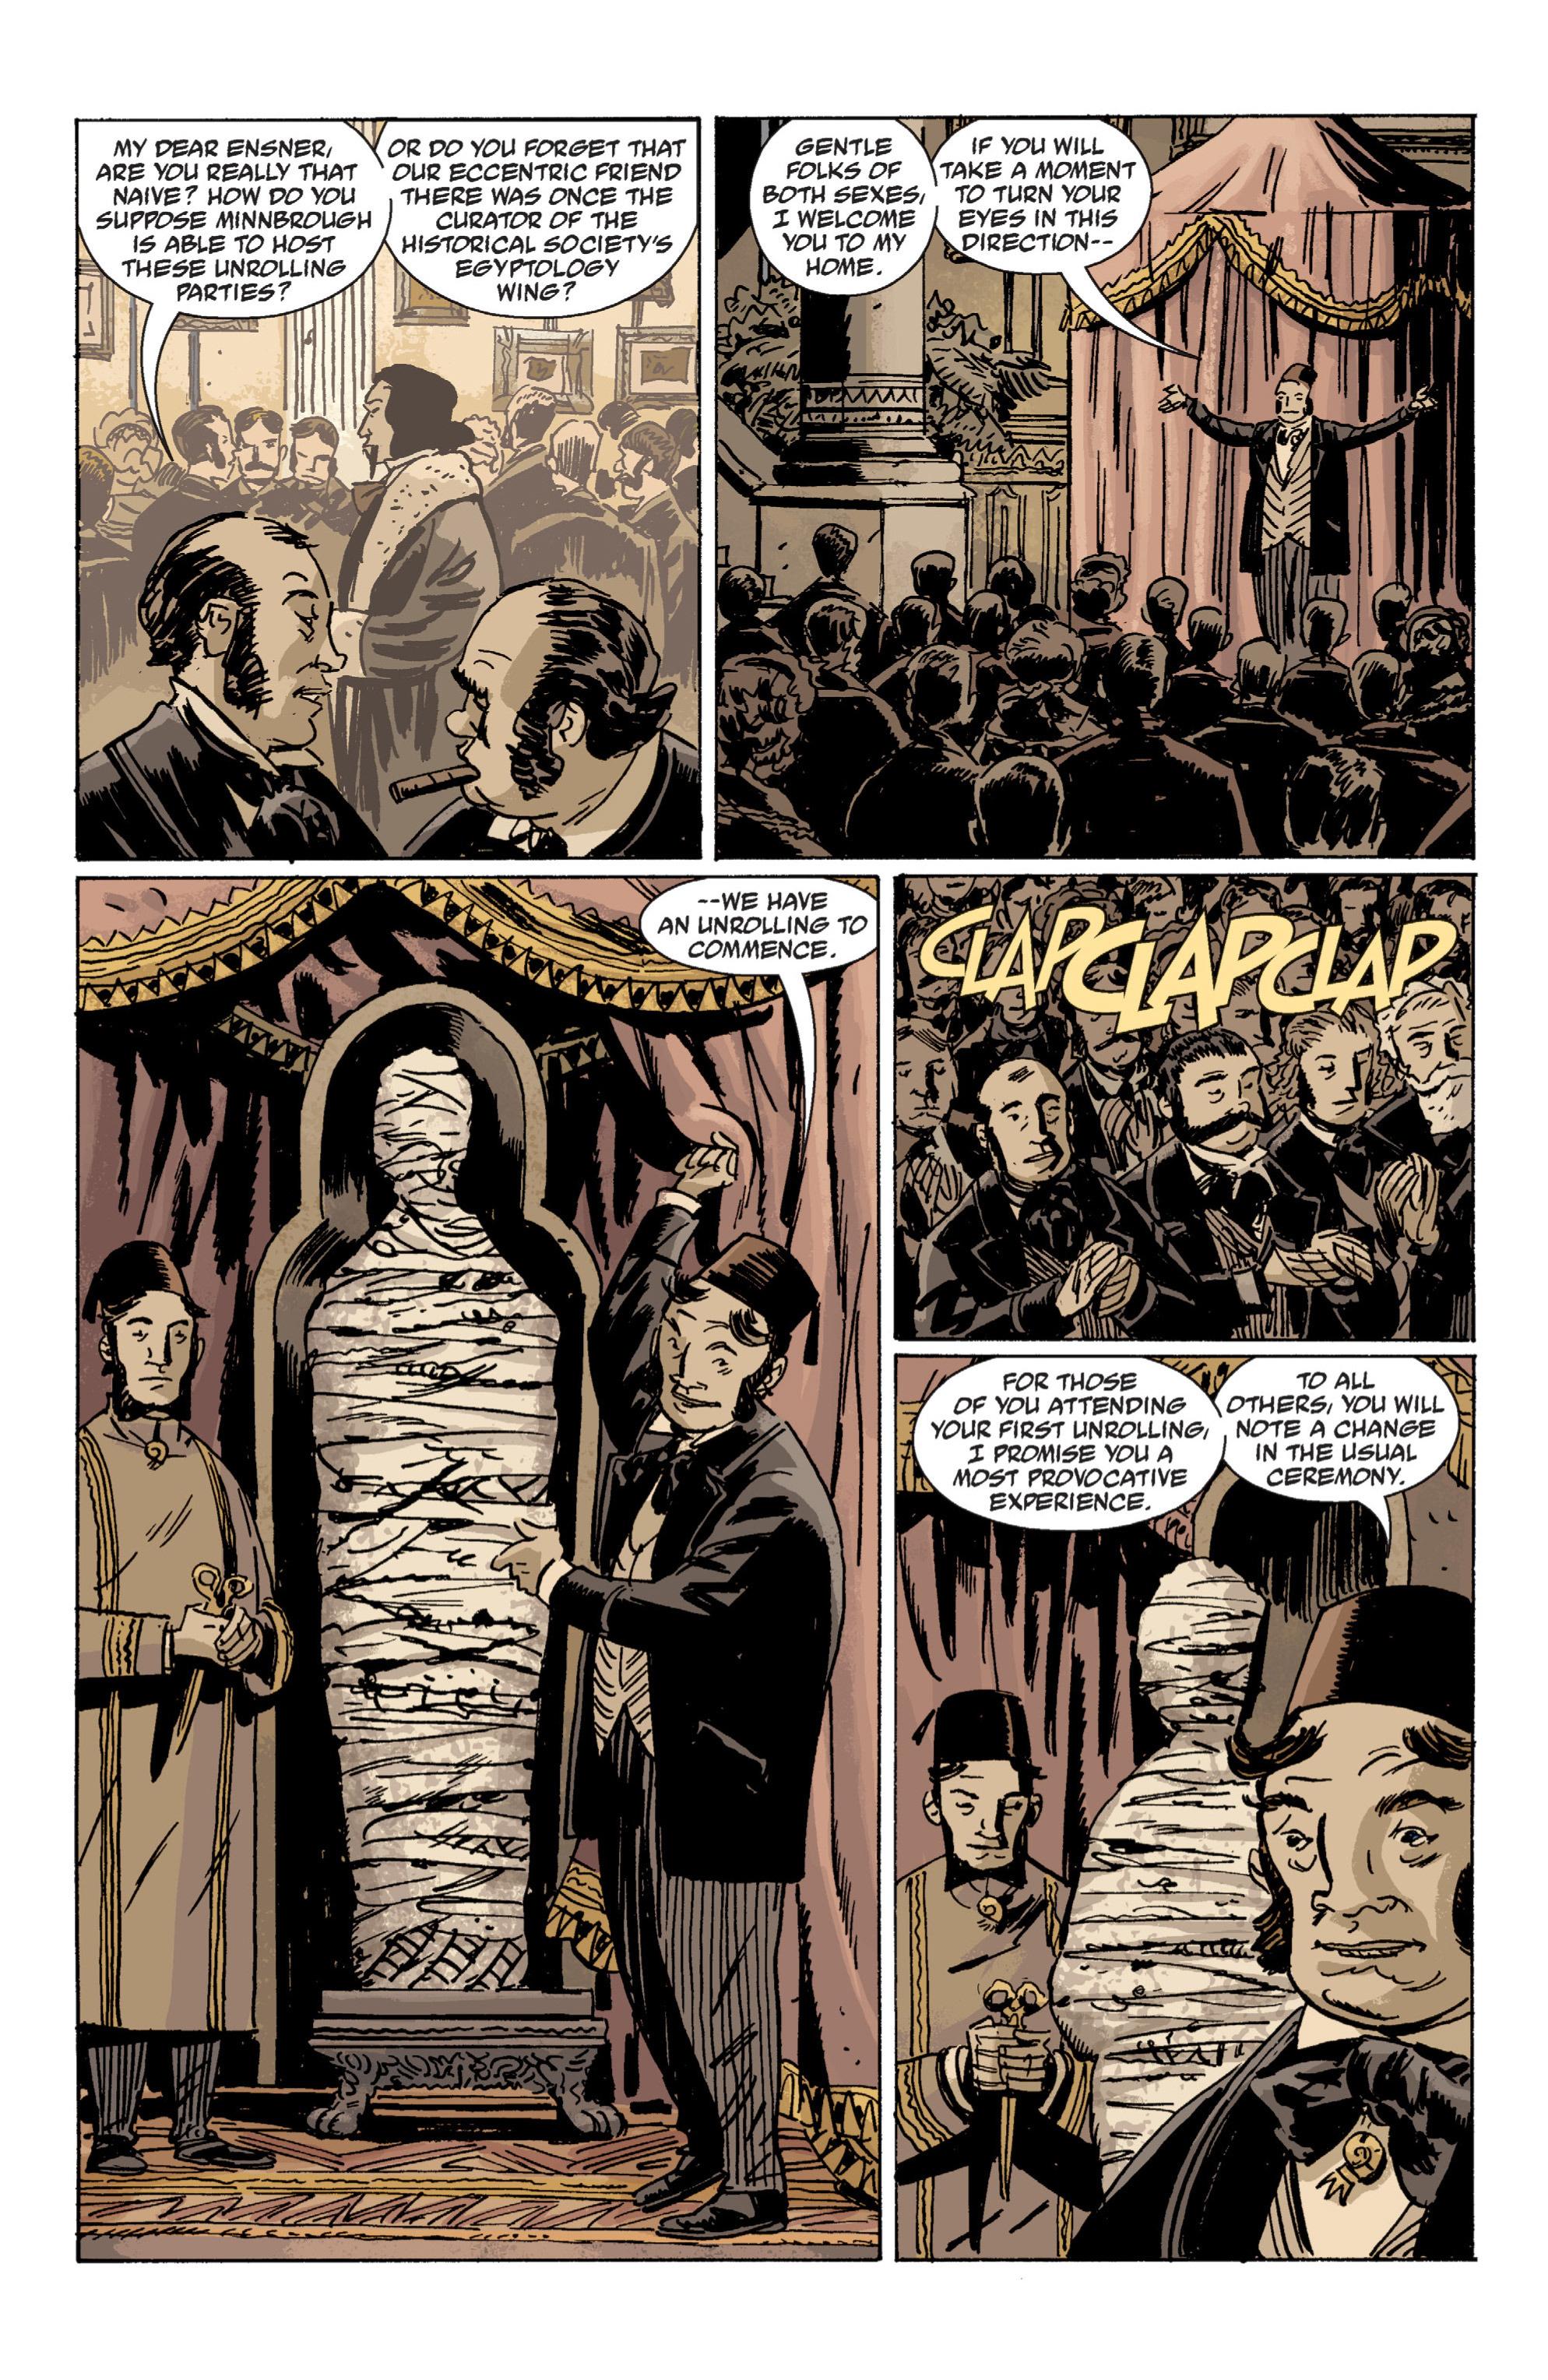 Read online B.P.R.D. (2003) comic -  Issue # TPB 7 - 11